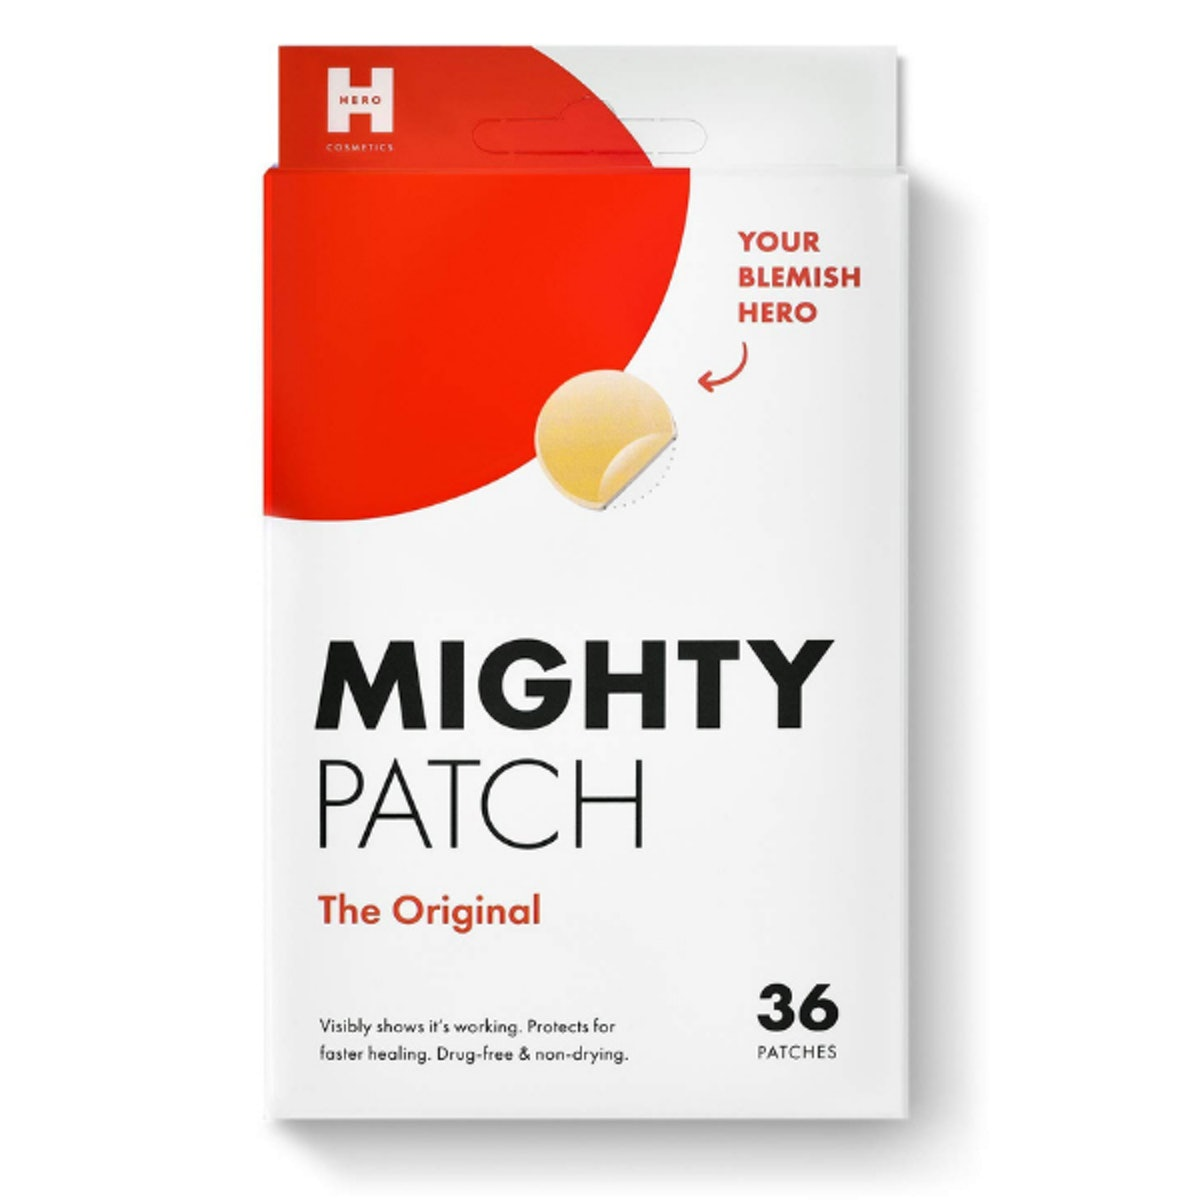 Hero Mighty Patch Original